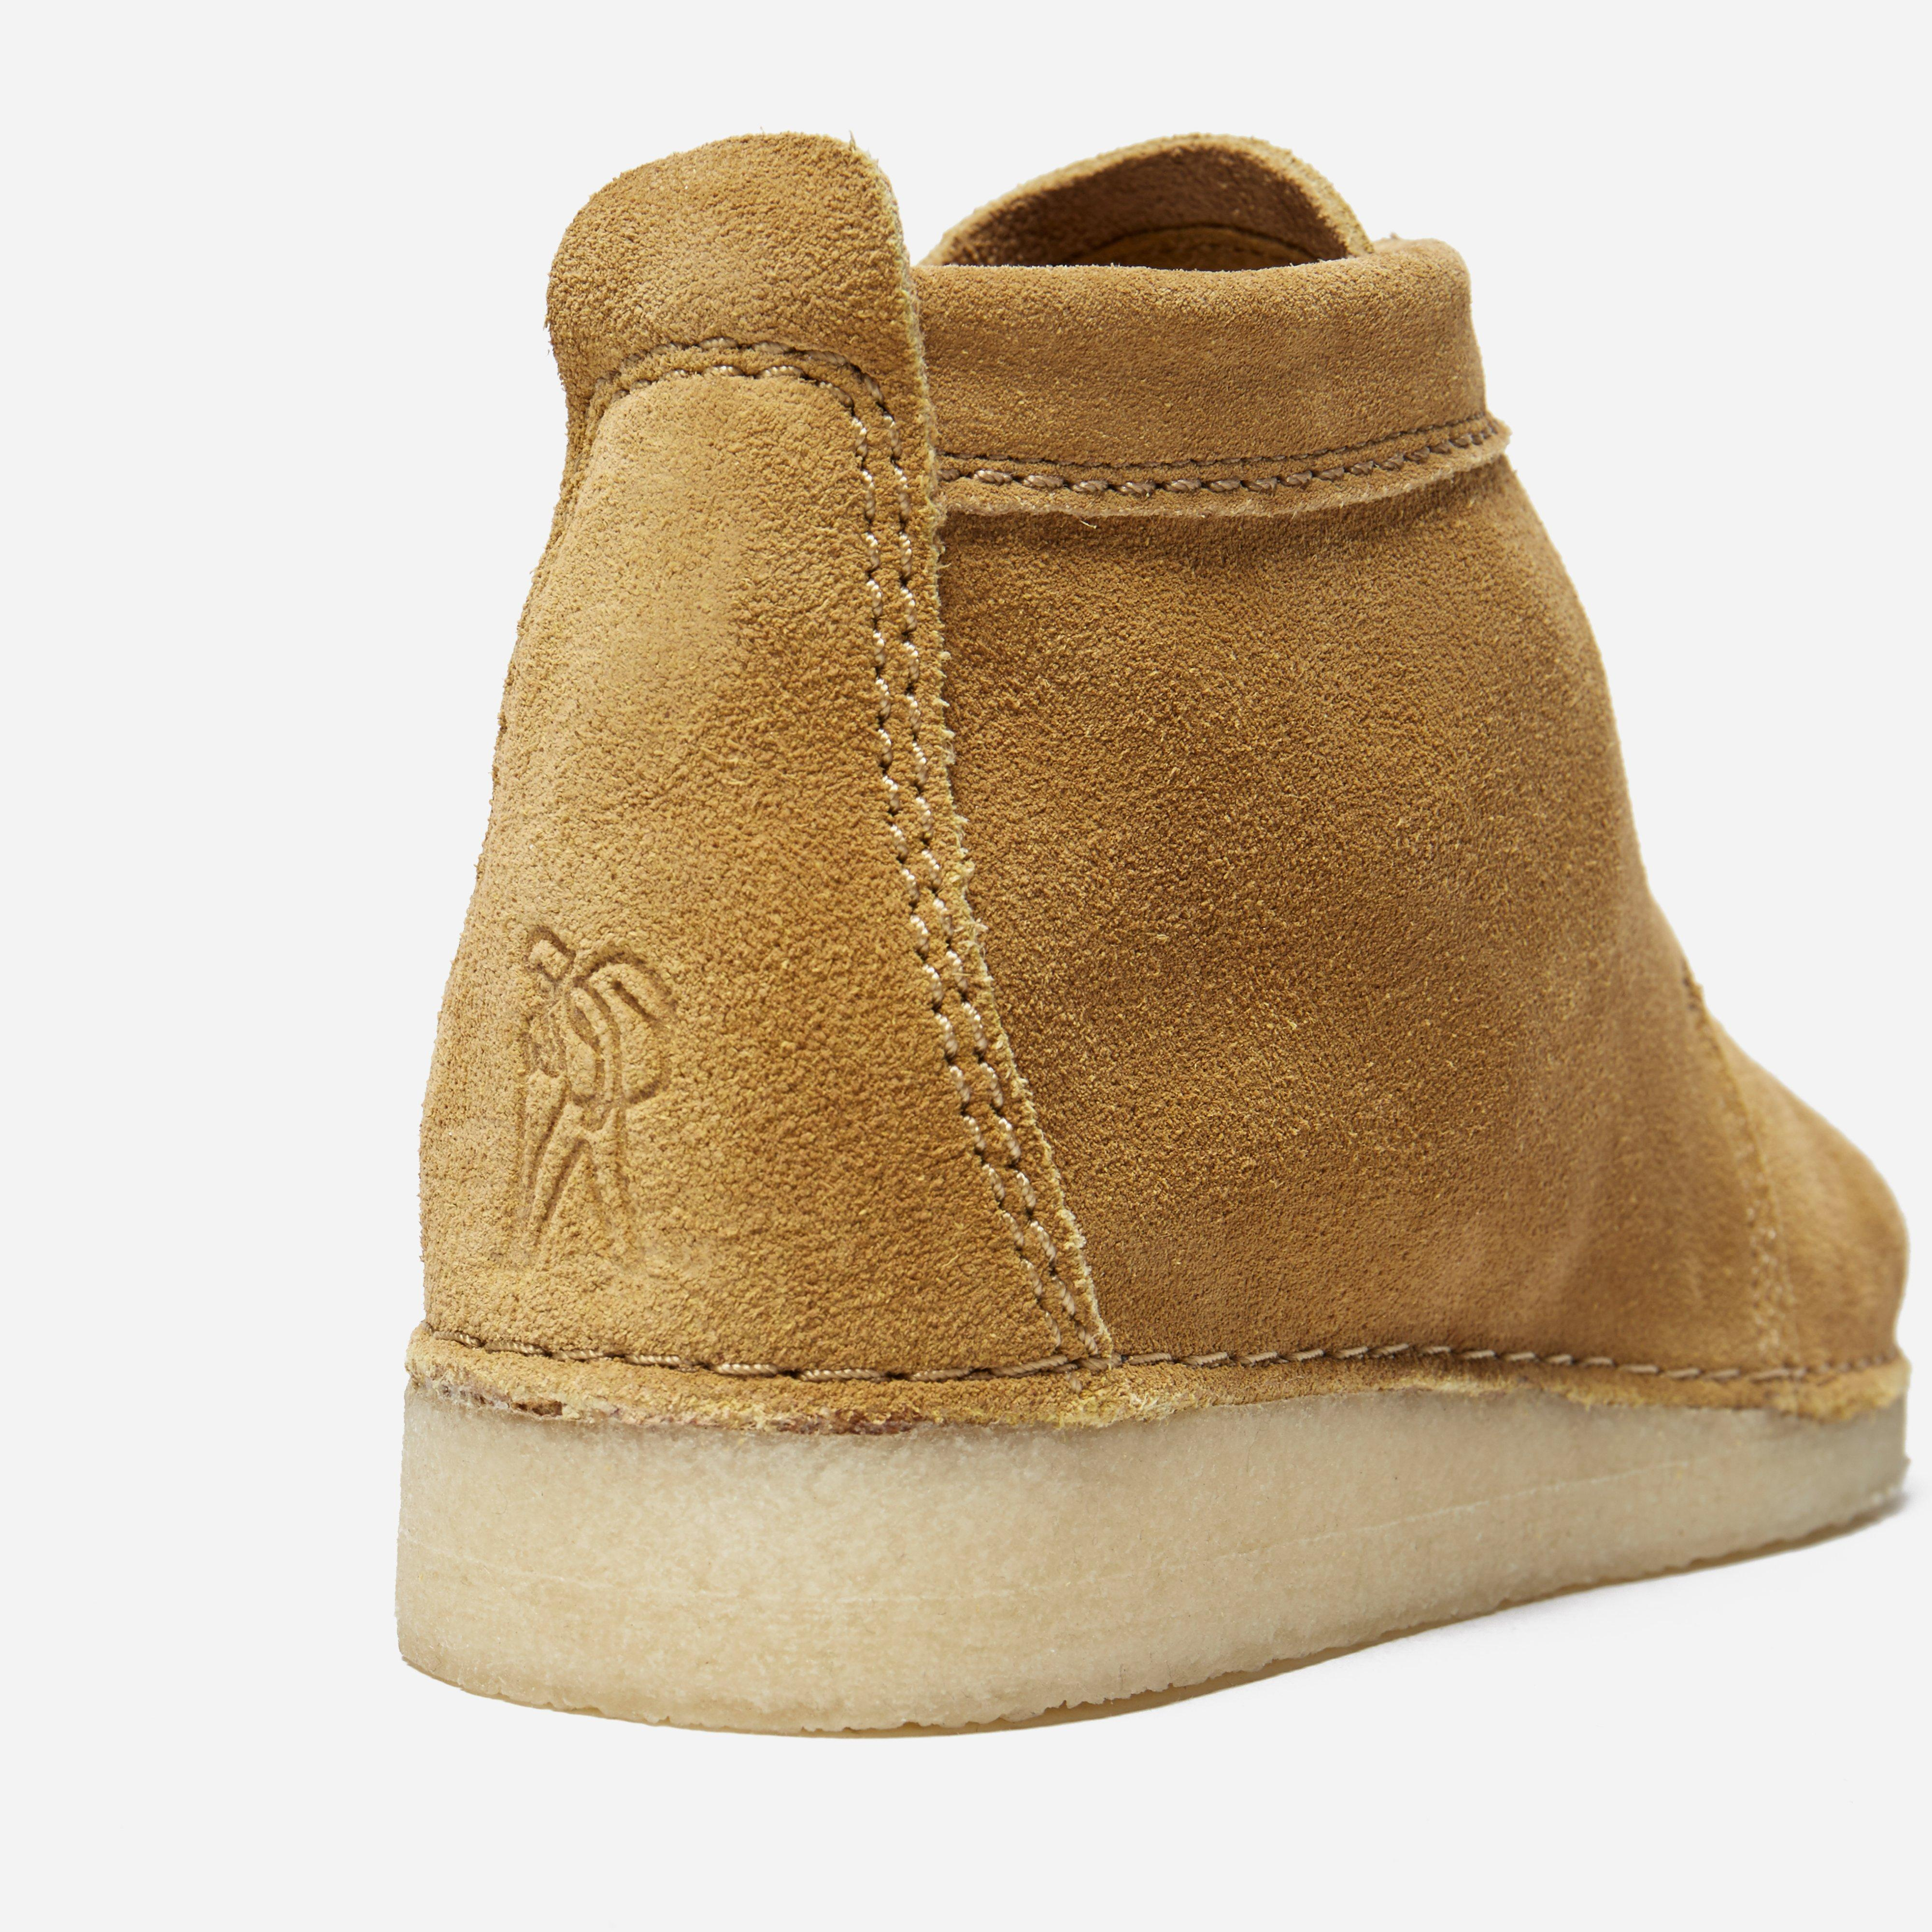 Clarks Ashton Boot in Beige (Natural